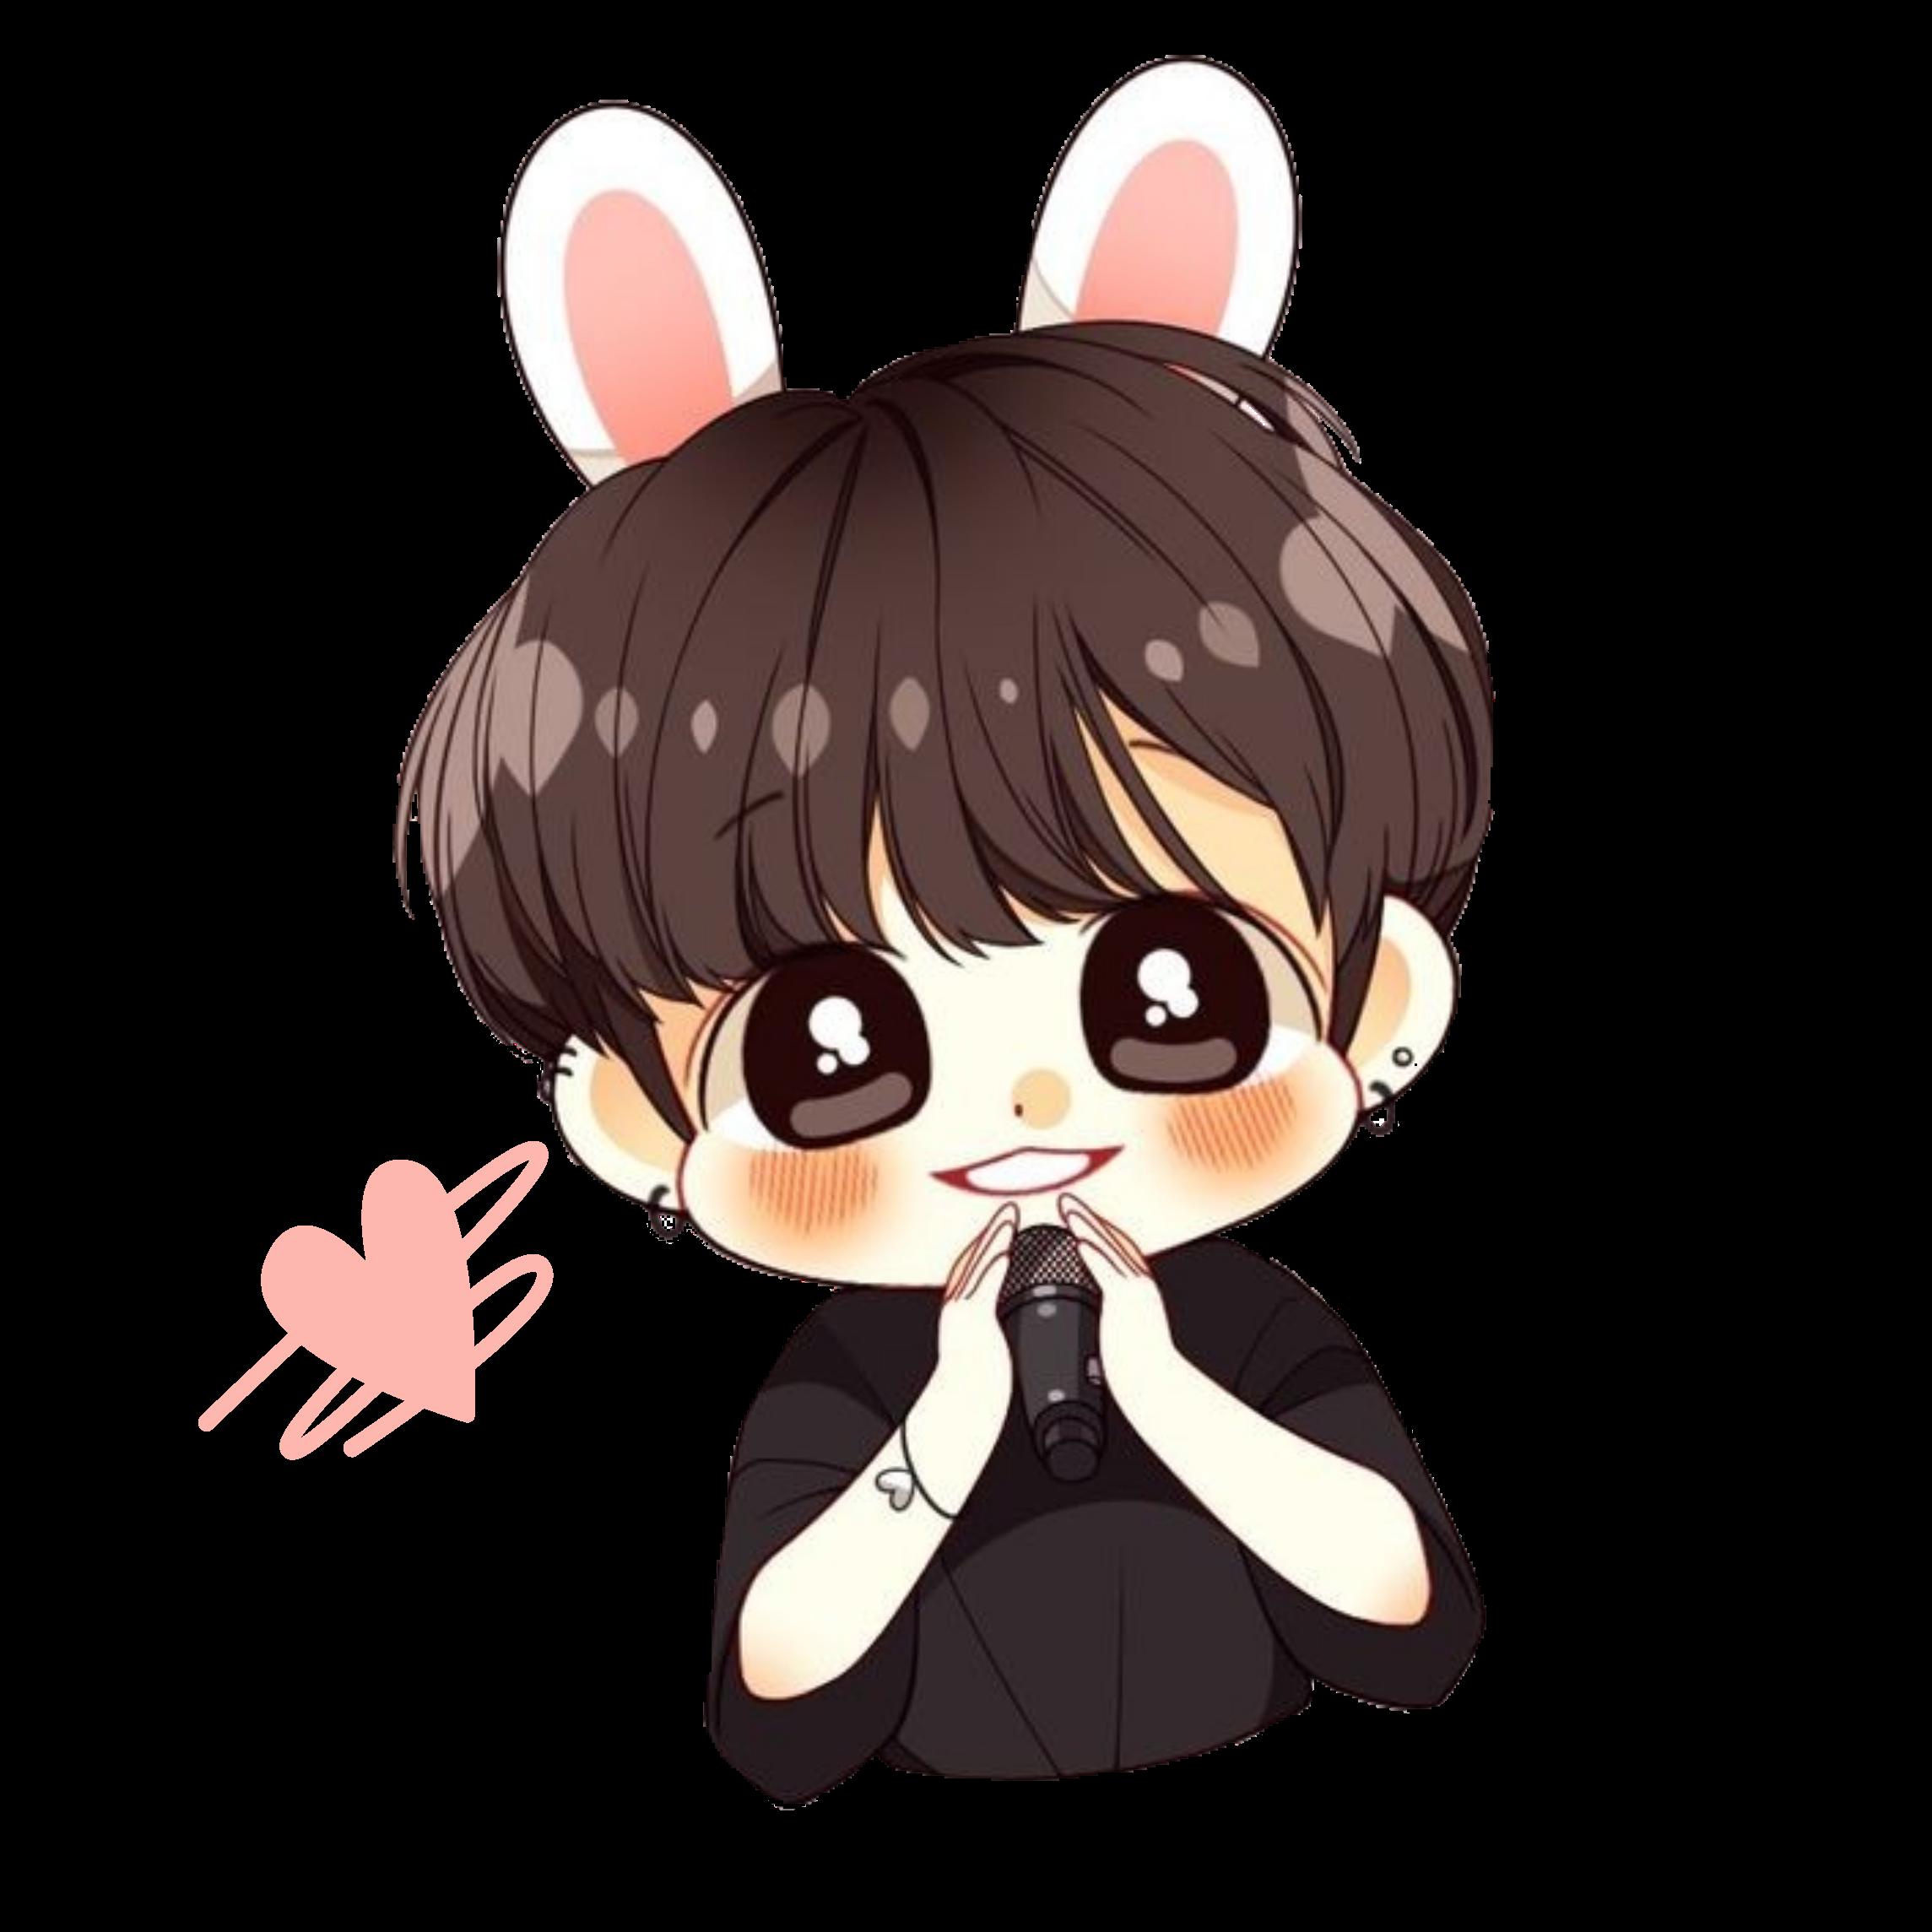 Bts Jungkook Cute Chibi Btsjungkook